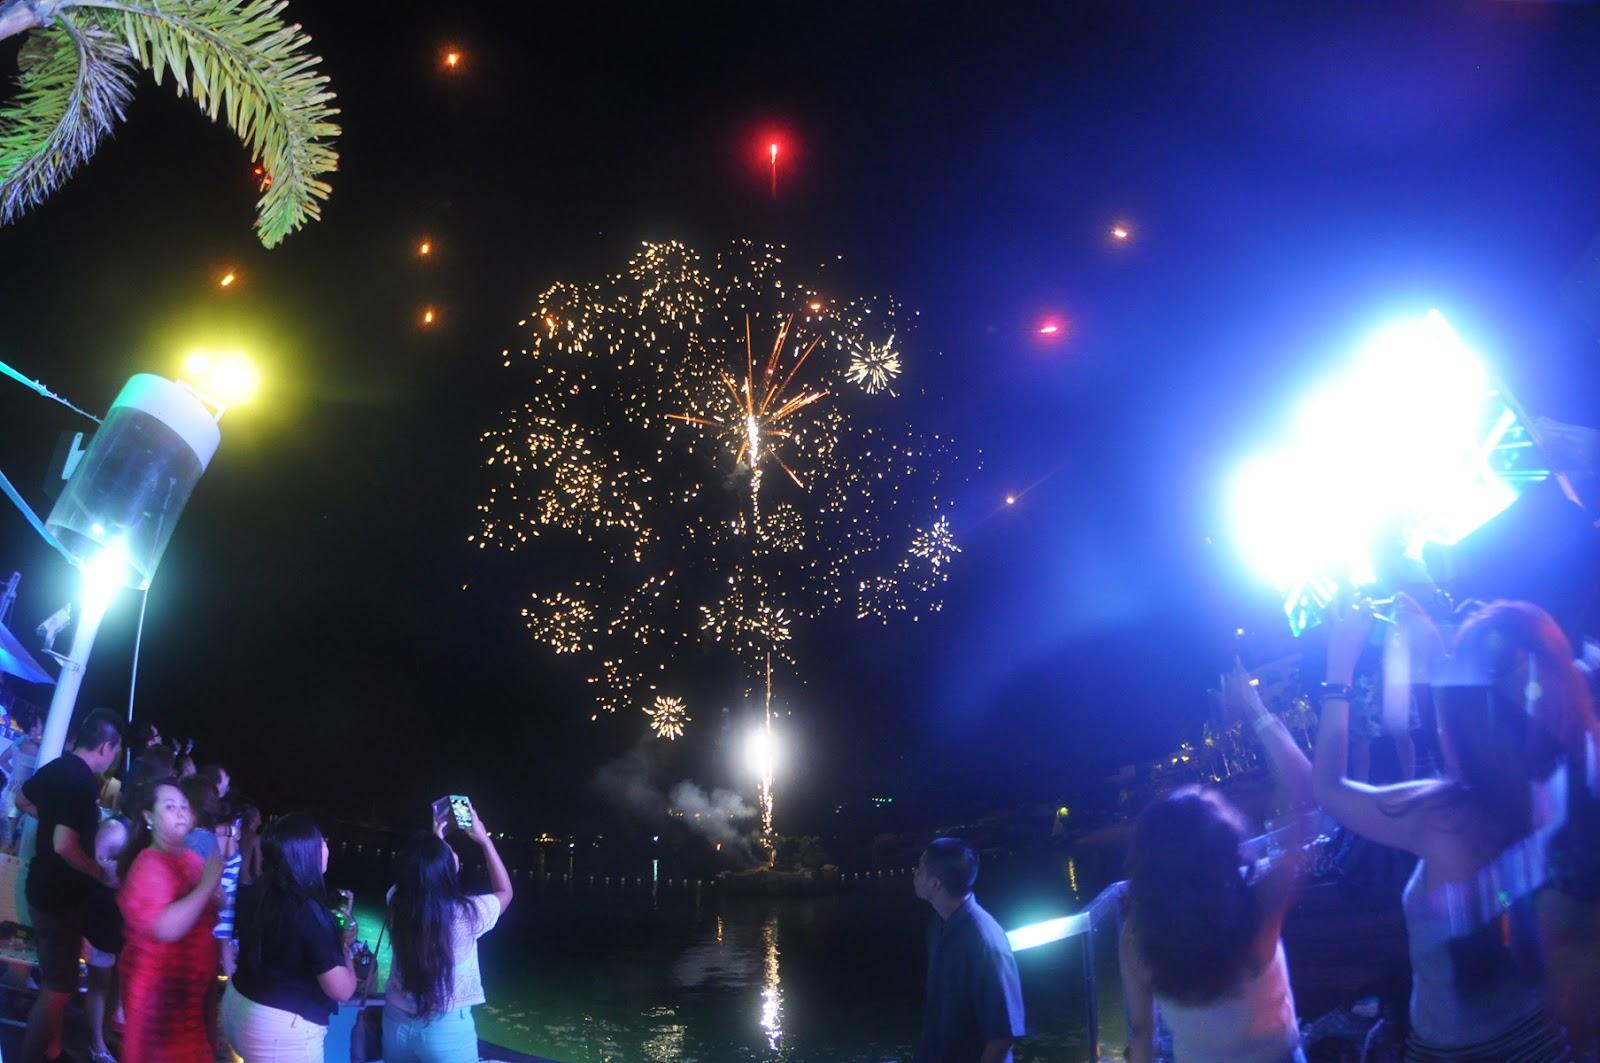 IBIZA BEACH CLUB, Movenpick Hotel Mactan Island Cebu, Movenpick Resort, Cebu Hotels, Mactan Hotels, Best Cebu Beaches, Where to stay in Cebu, Where to stay in Mactan, Lapu-Lapu City, Electro Beach Festival, Summer Party, Cebu Lifestyle Blogger, Cebu Blogger, Cebu Fashion Blogger, Cebu Blogs